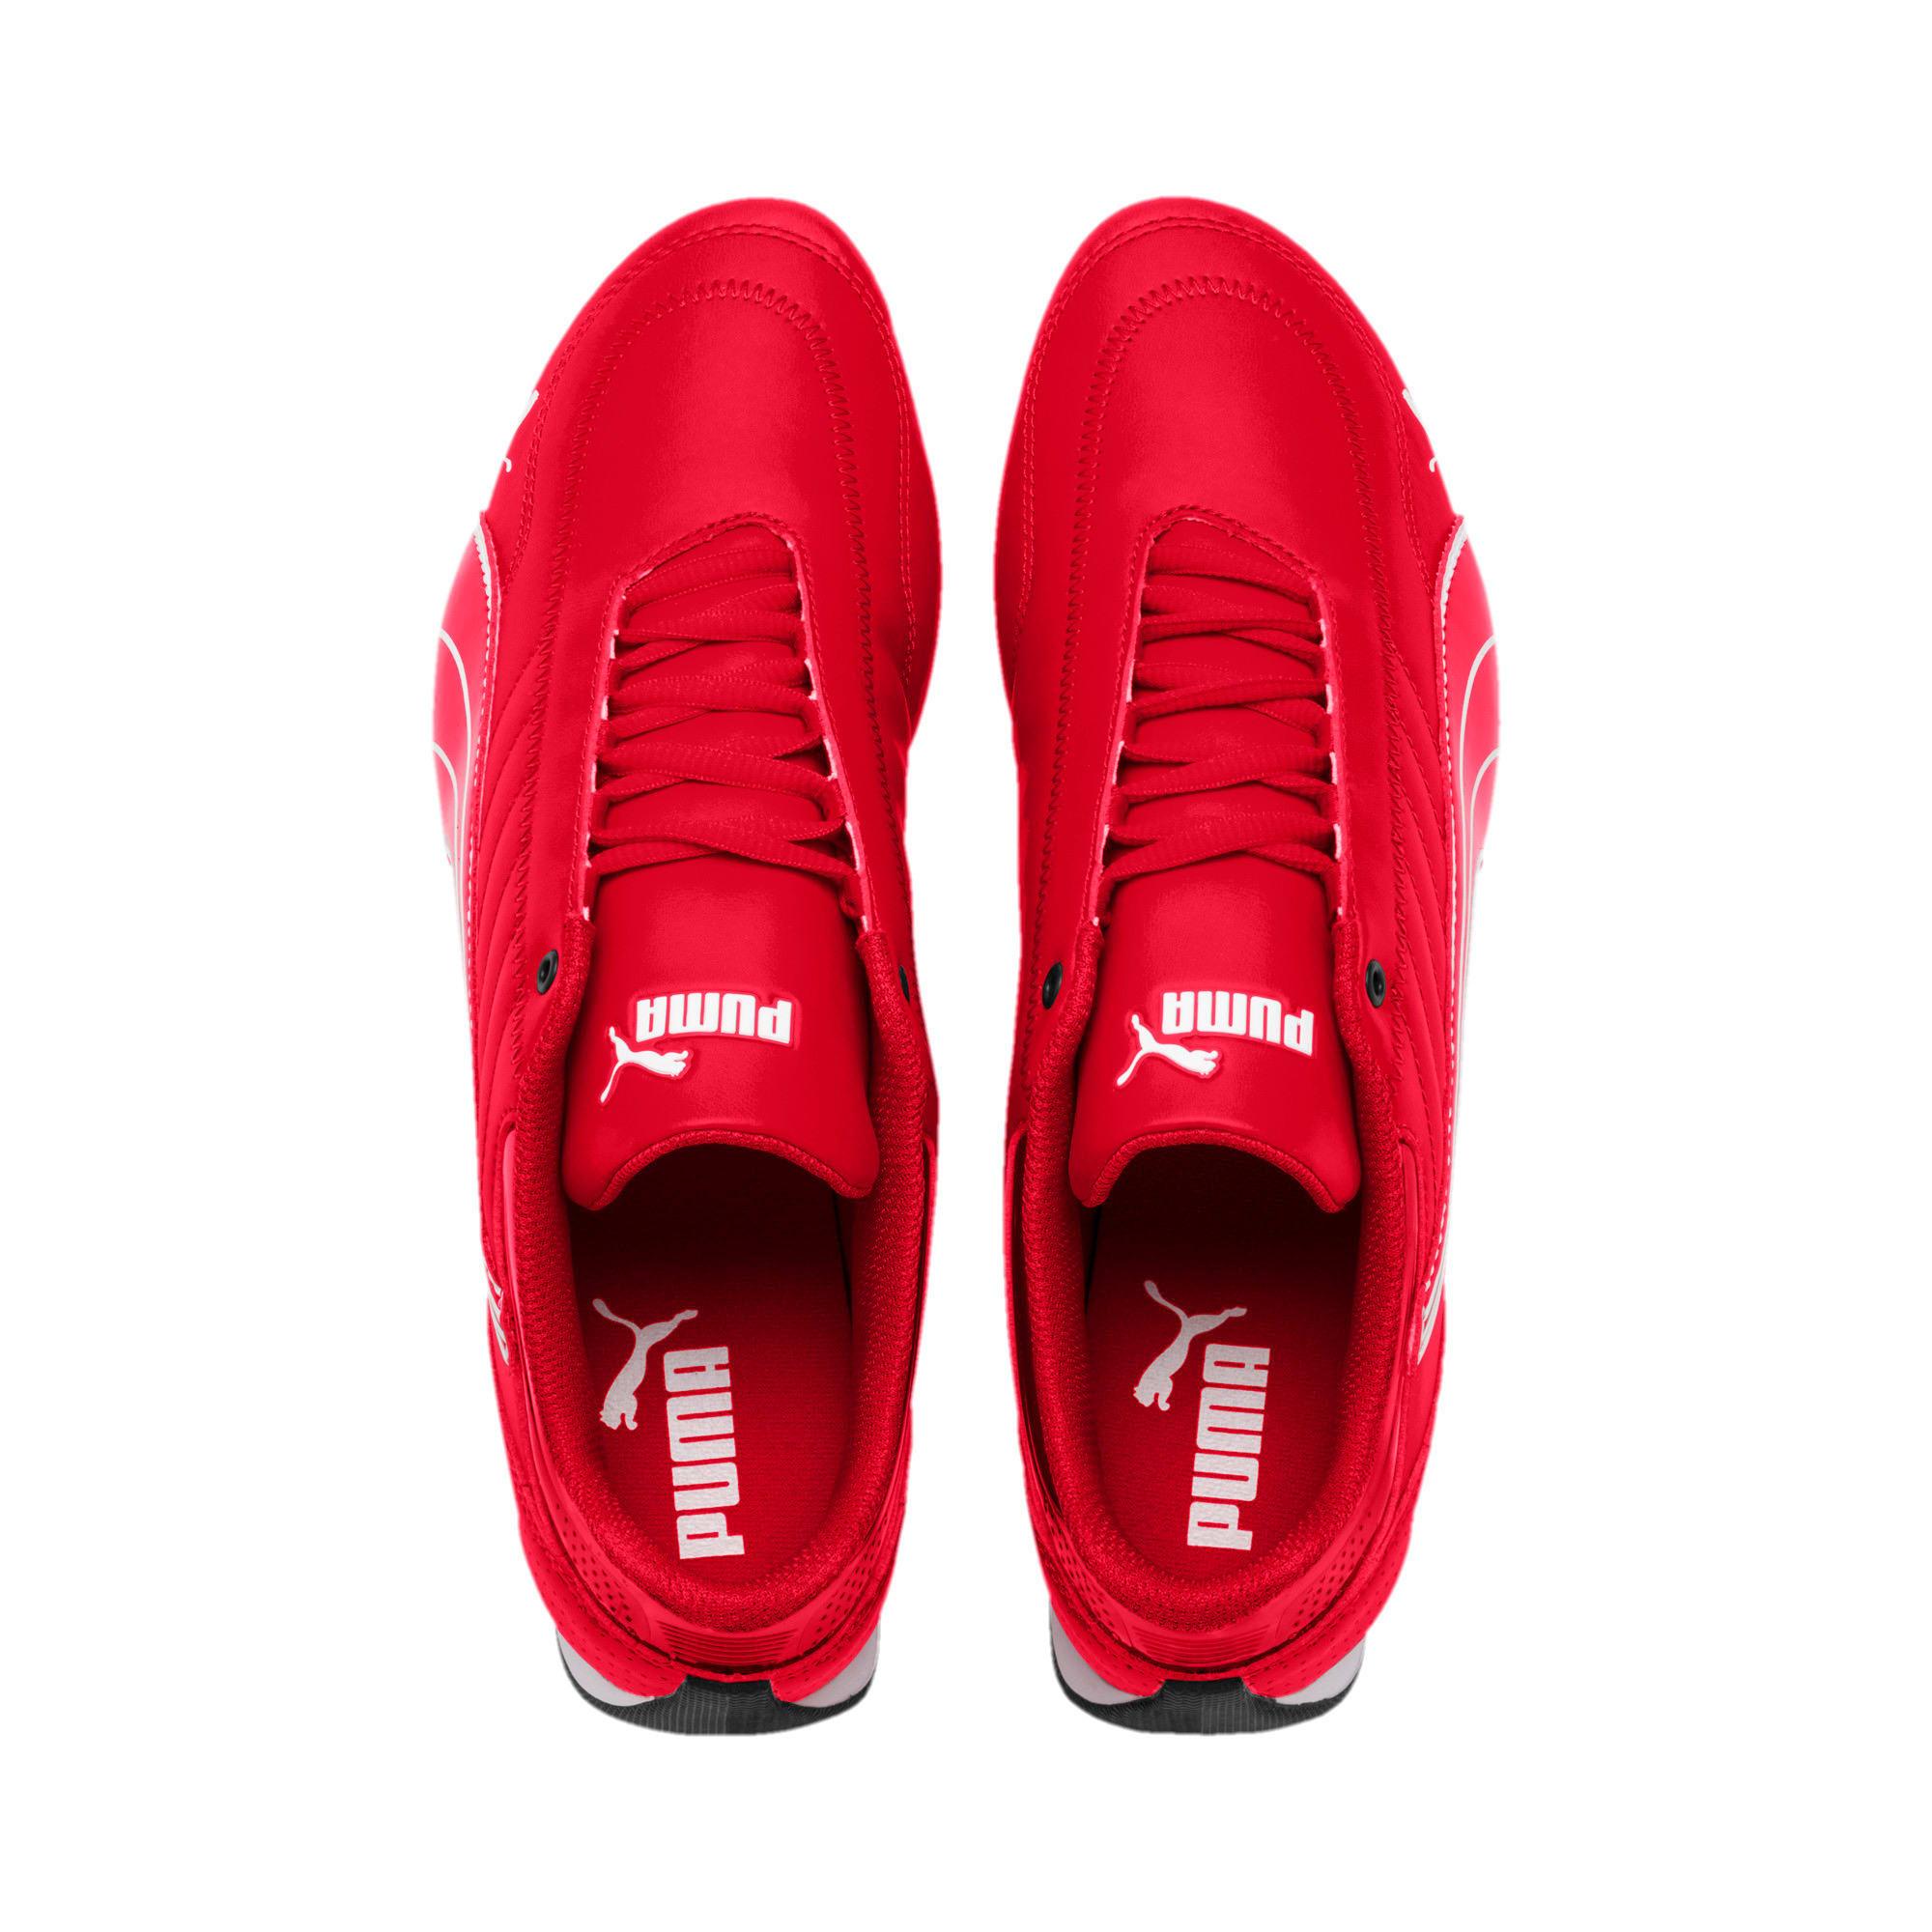 Miniatura 7 de ZapatosScuderiaFerrariFuture Kart Cat, Rosso Corsa-Puma Black, mediano